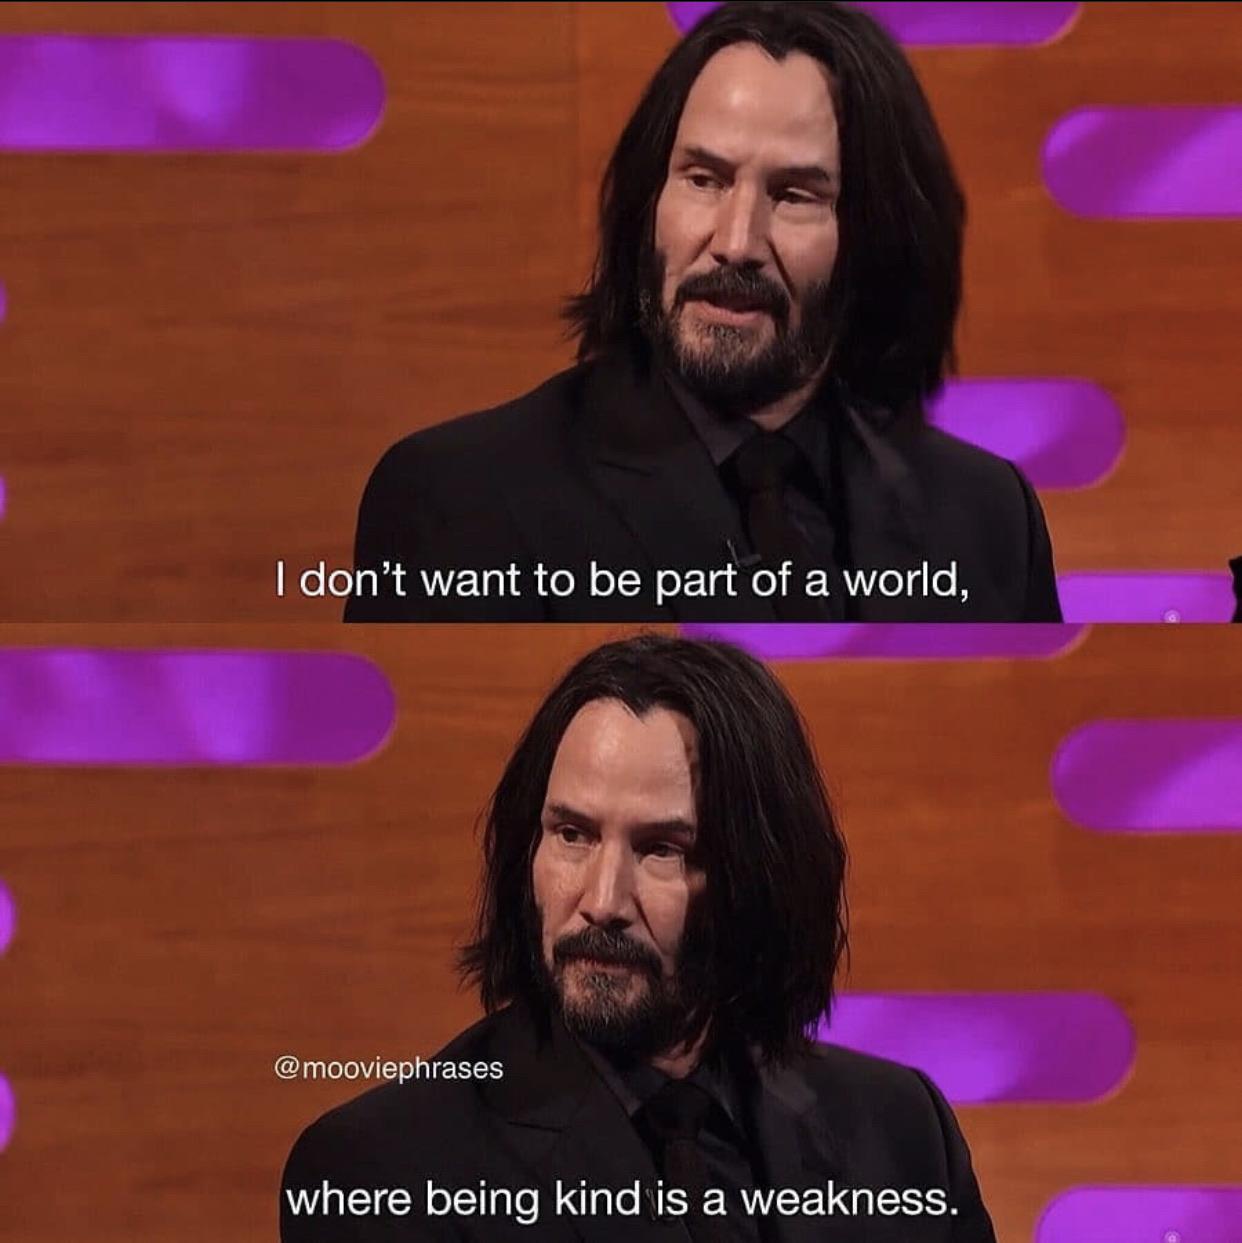 Keanu in an interview